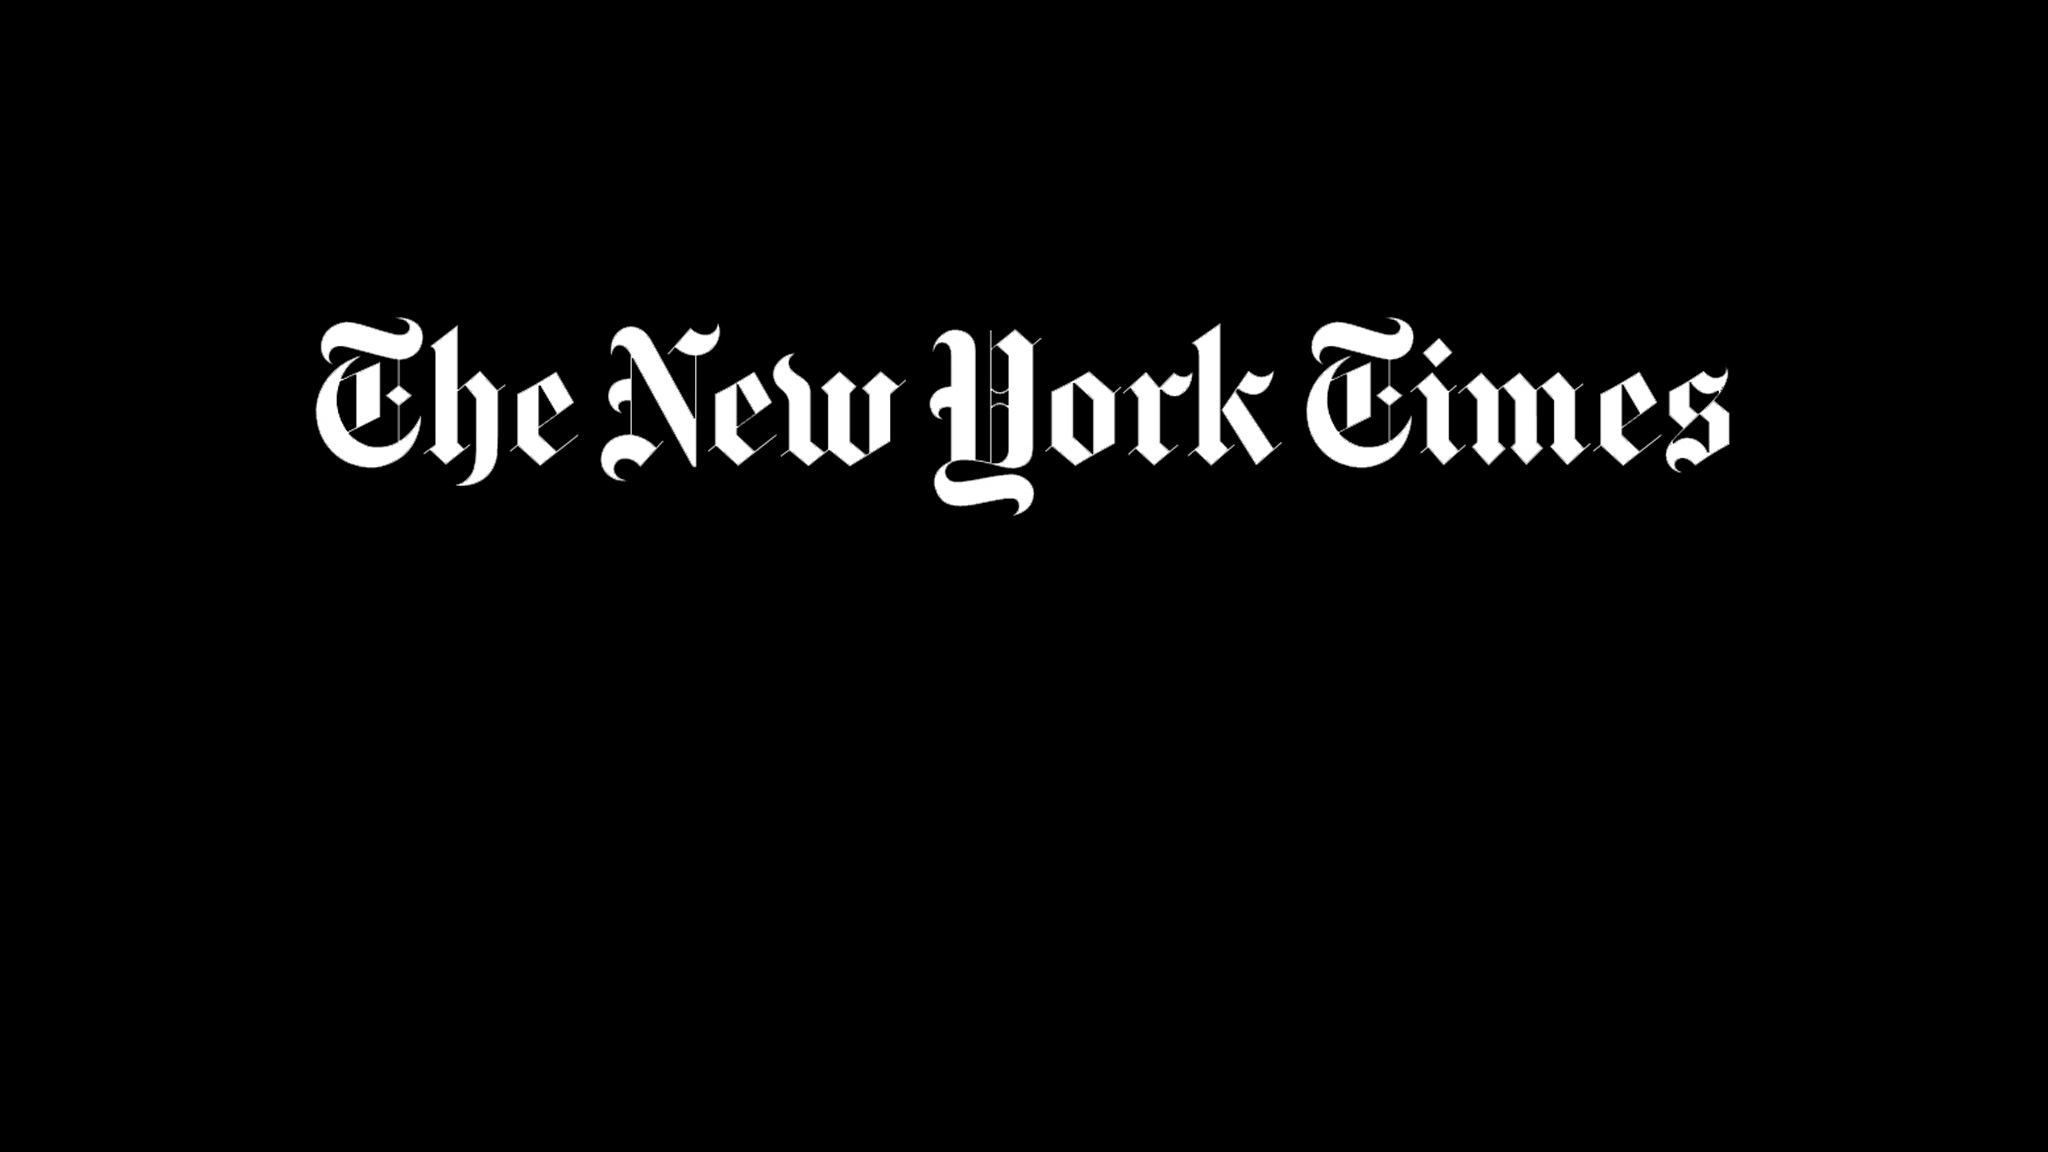 New York Times | DeLoreanDirectory.com